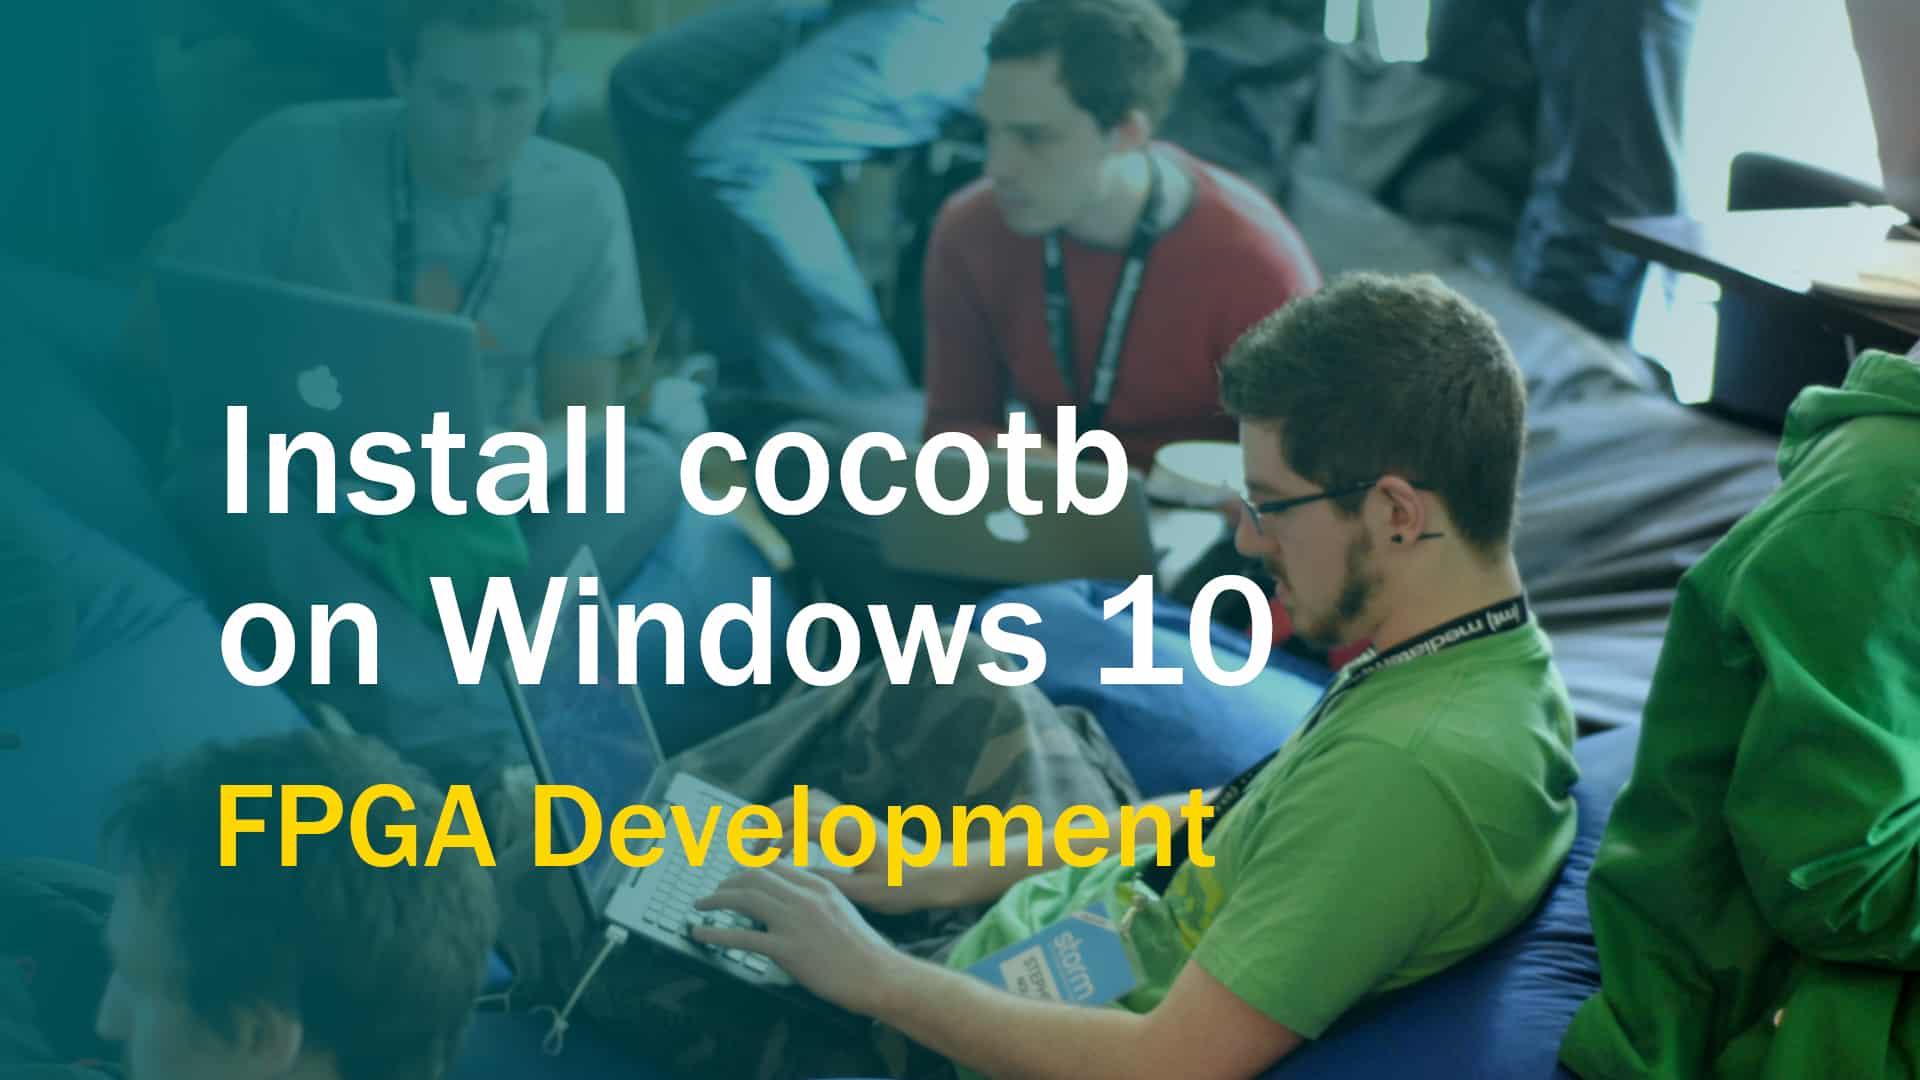 Install Cocotb on Windows 10 to Boost FPGA Verification Productivity